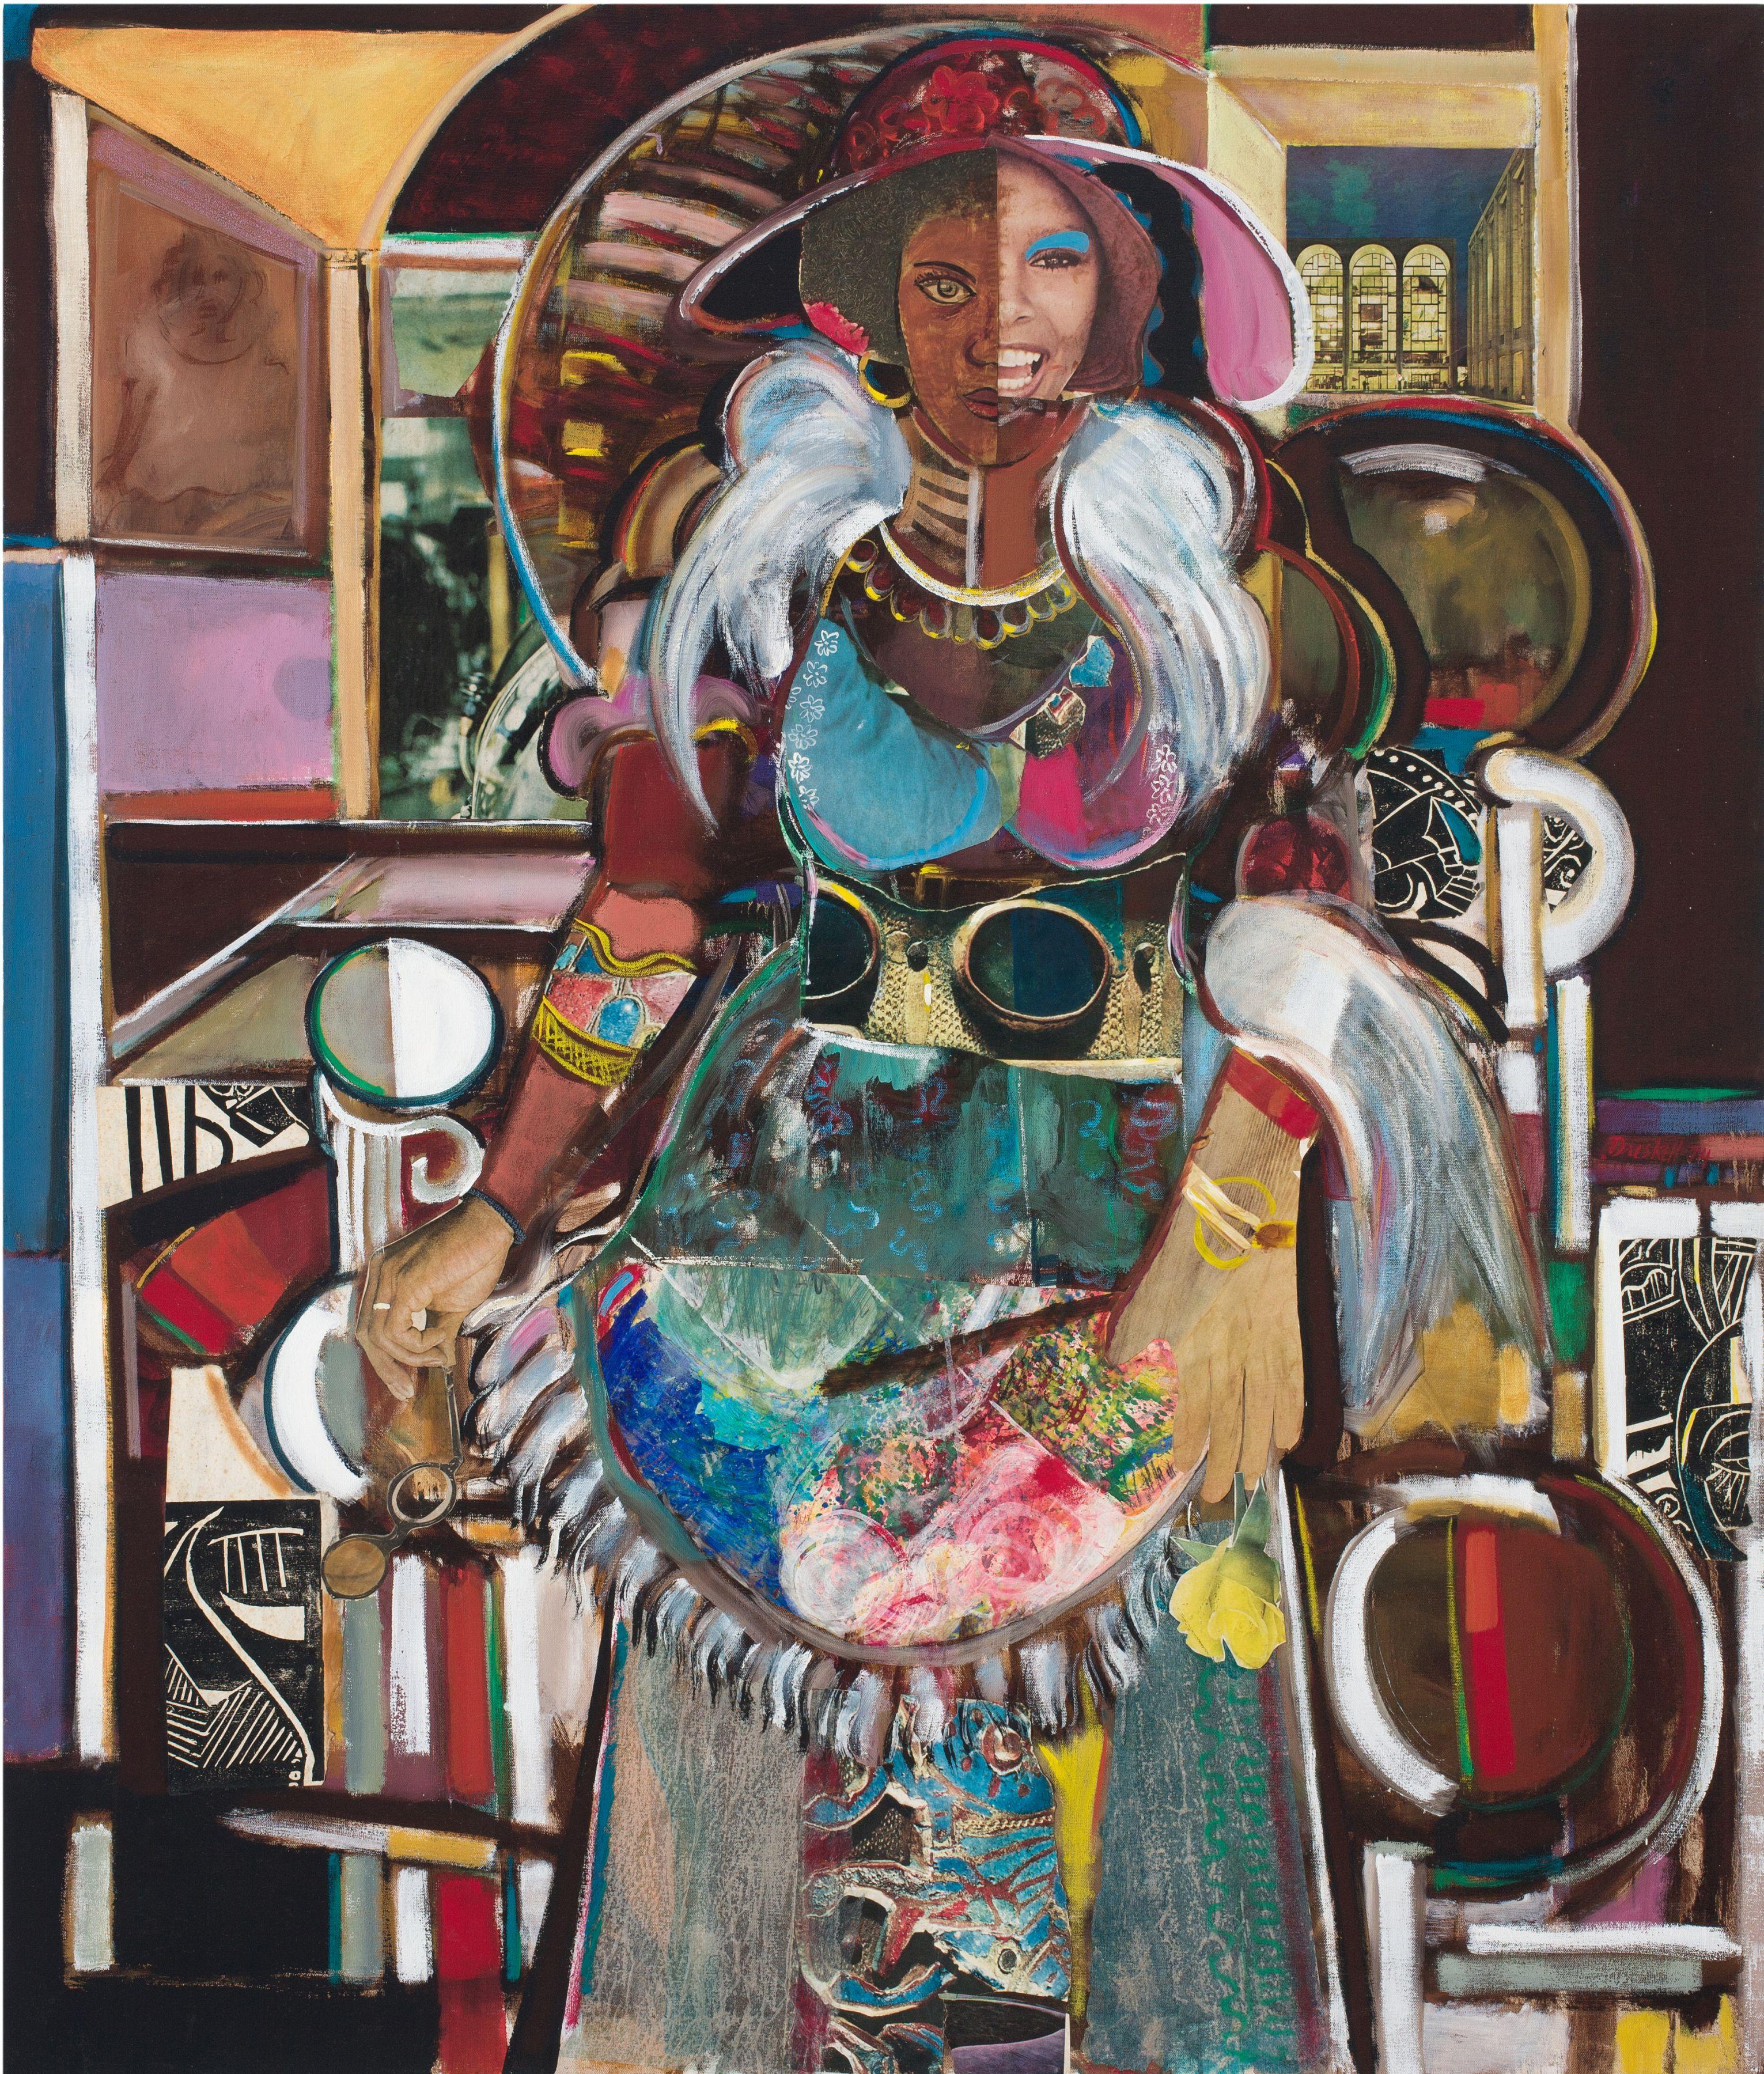 David Driskell, Jazz Dancer (Lady of Leisure, Fox), 1974